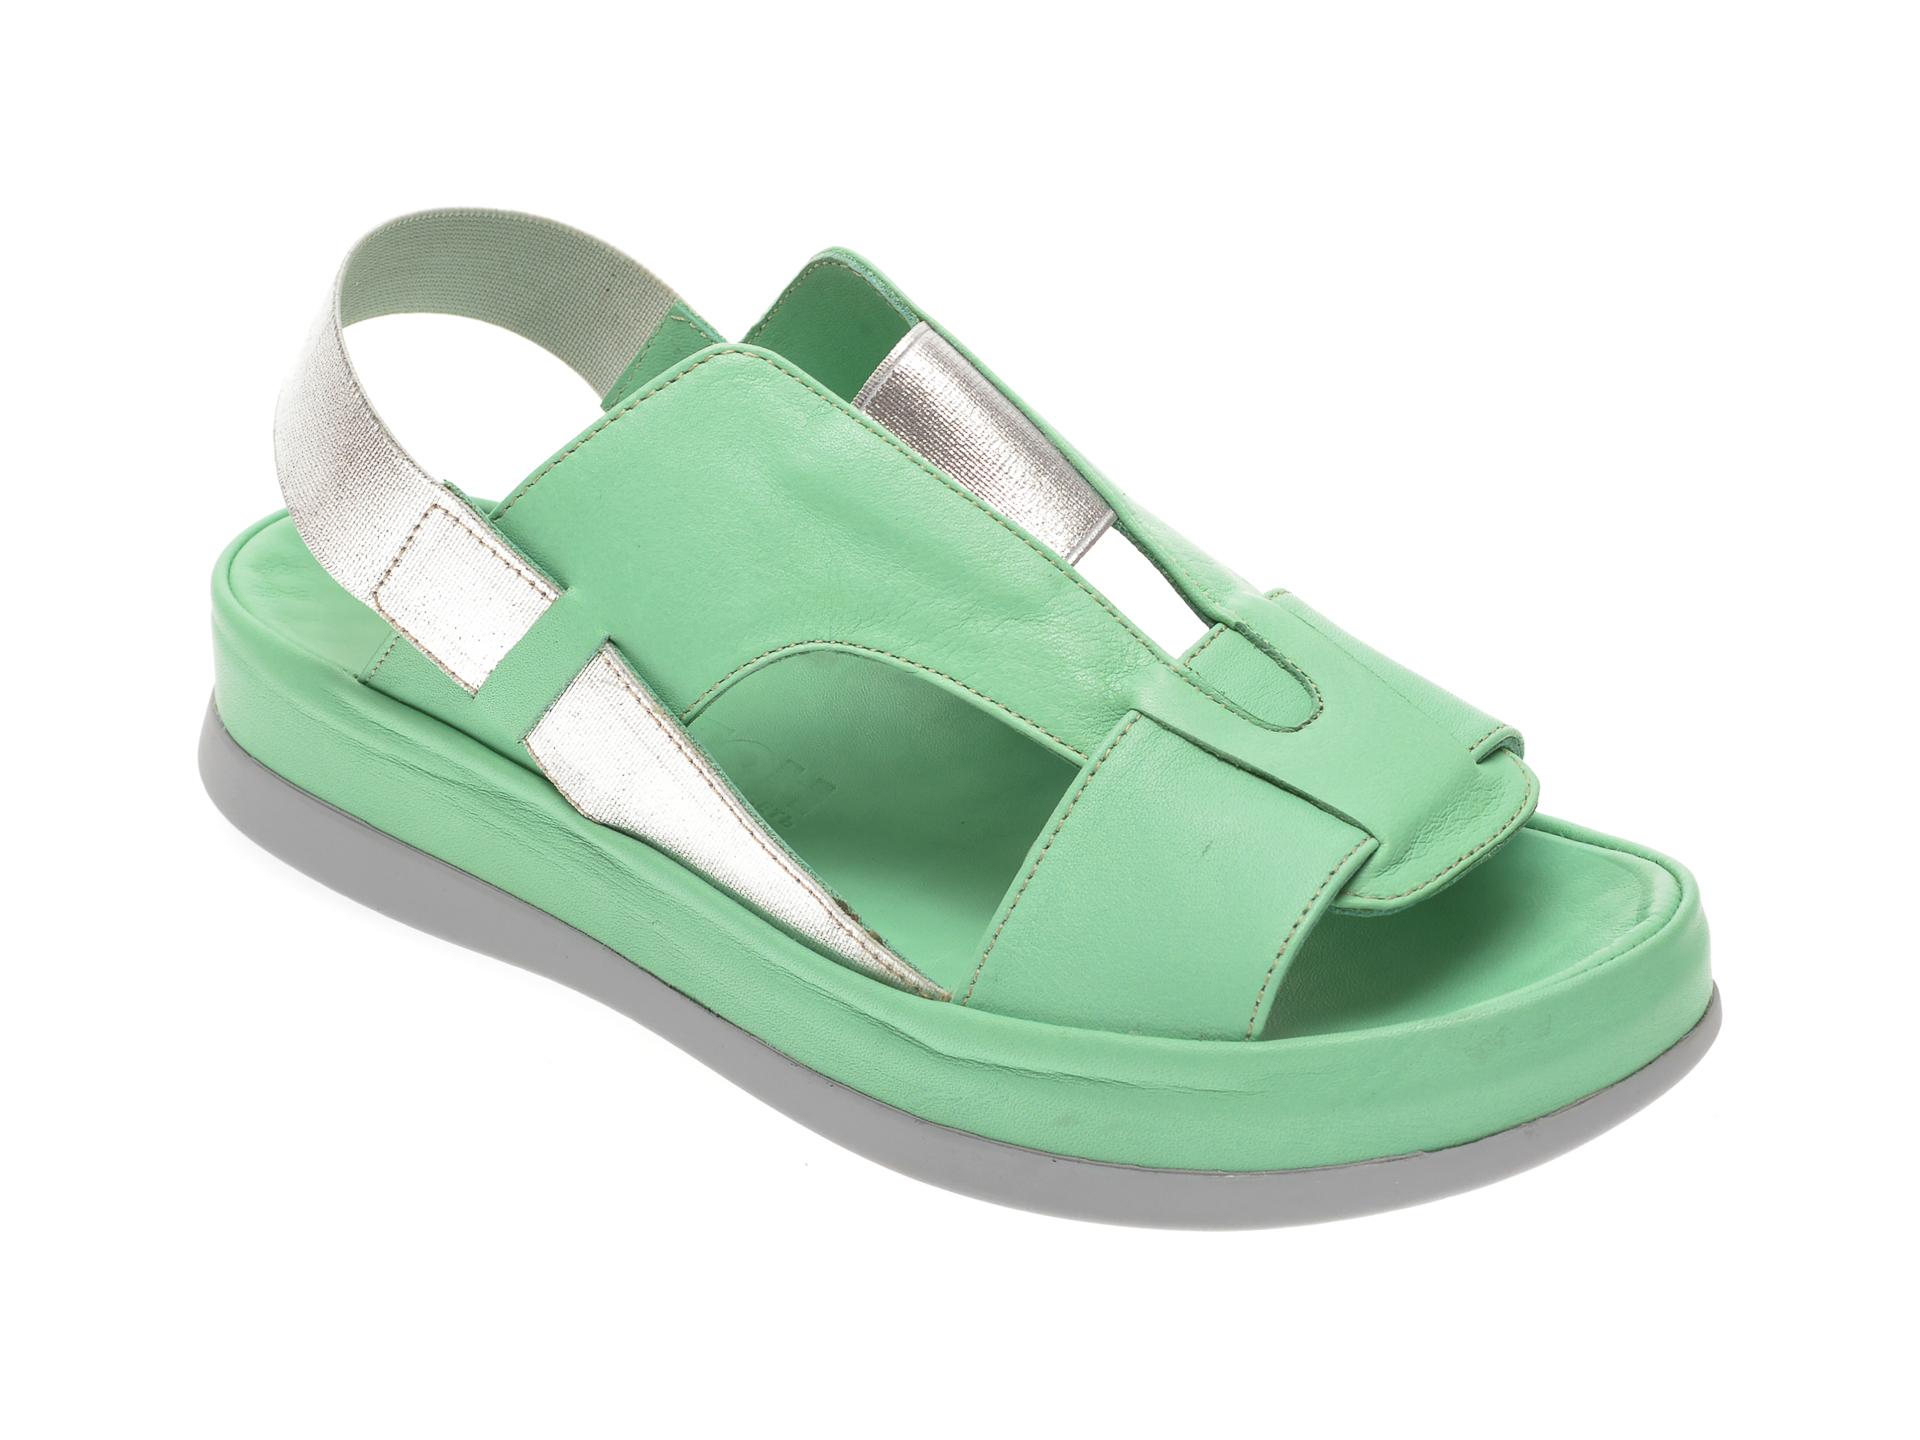 Sandale MISS LIZA verzi, 118PD11, din piele naturala